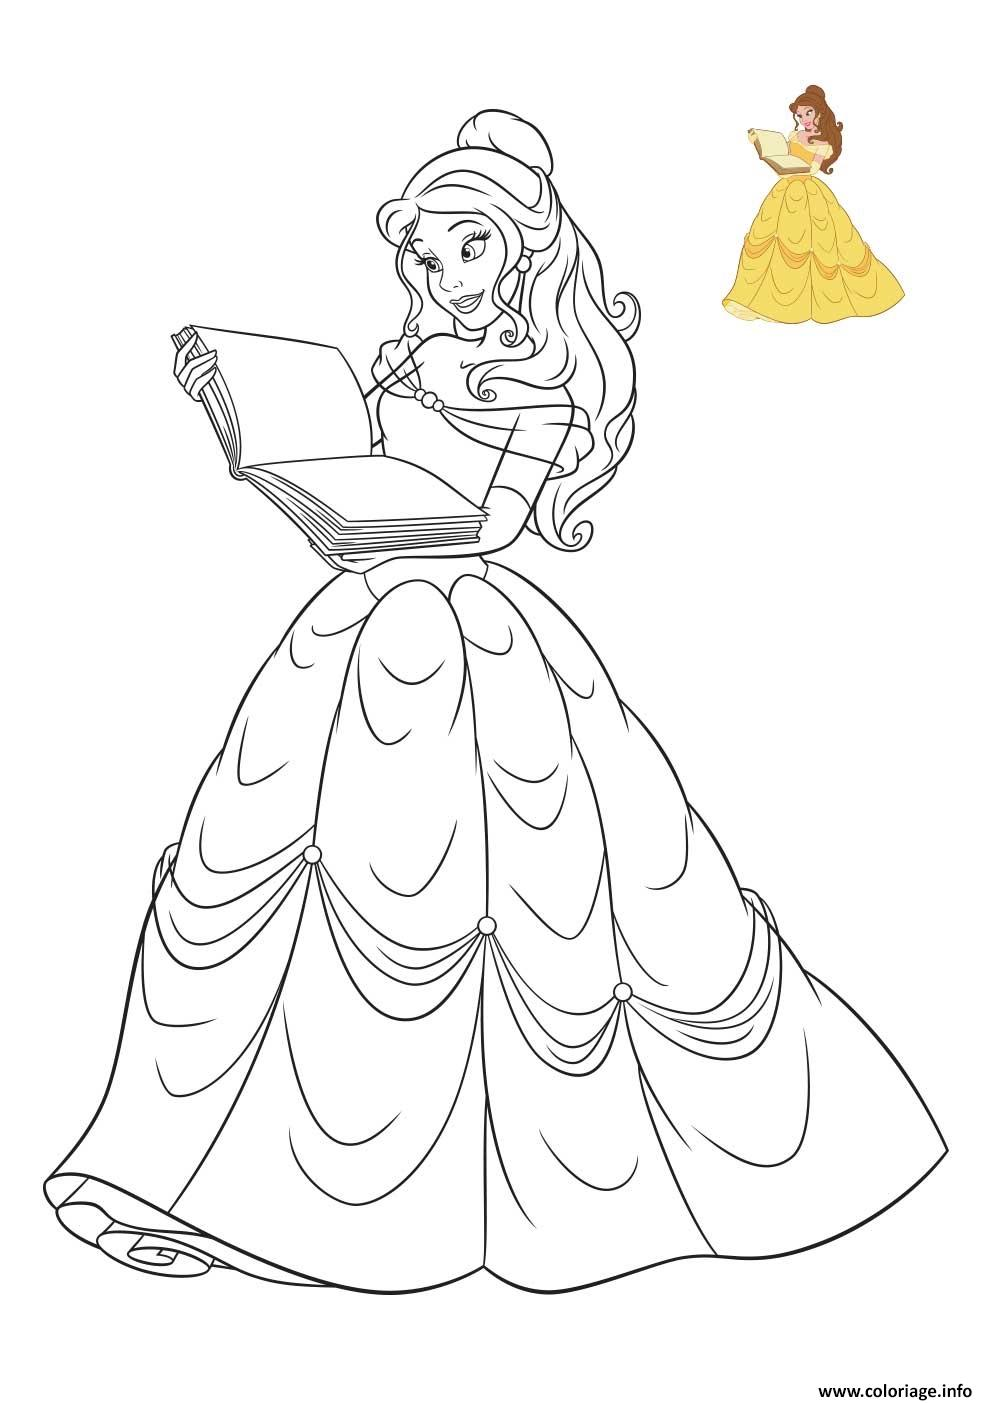 Dessin La Belle Et La Bete : dessin, belle, Coloriage, Princesse, Disney, Belle, Dessin, Imprimer